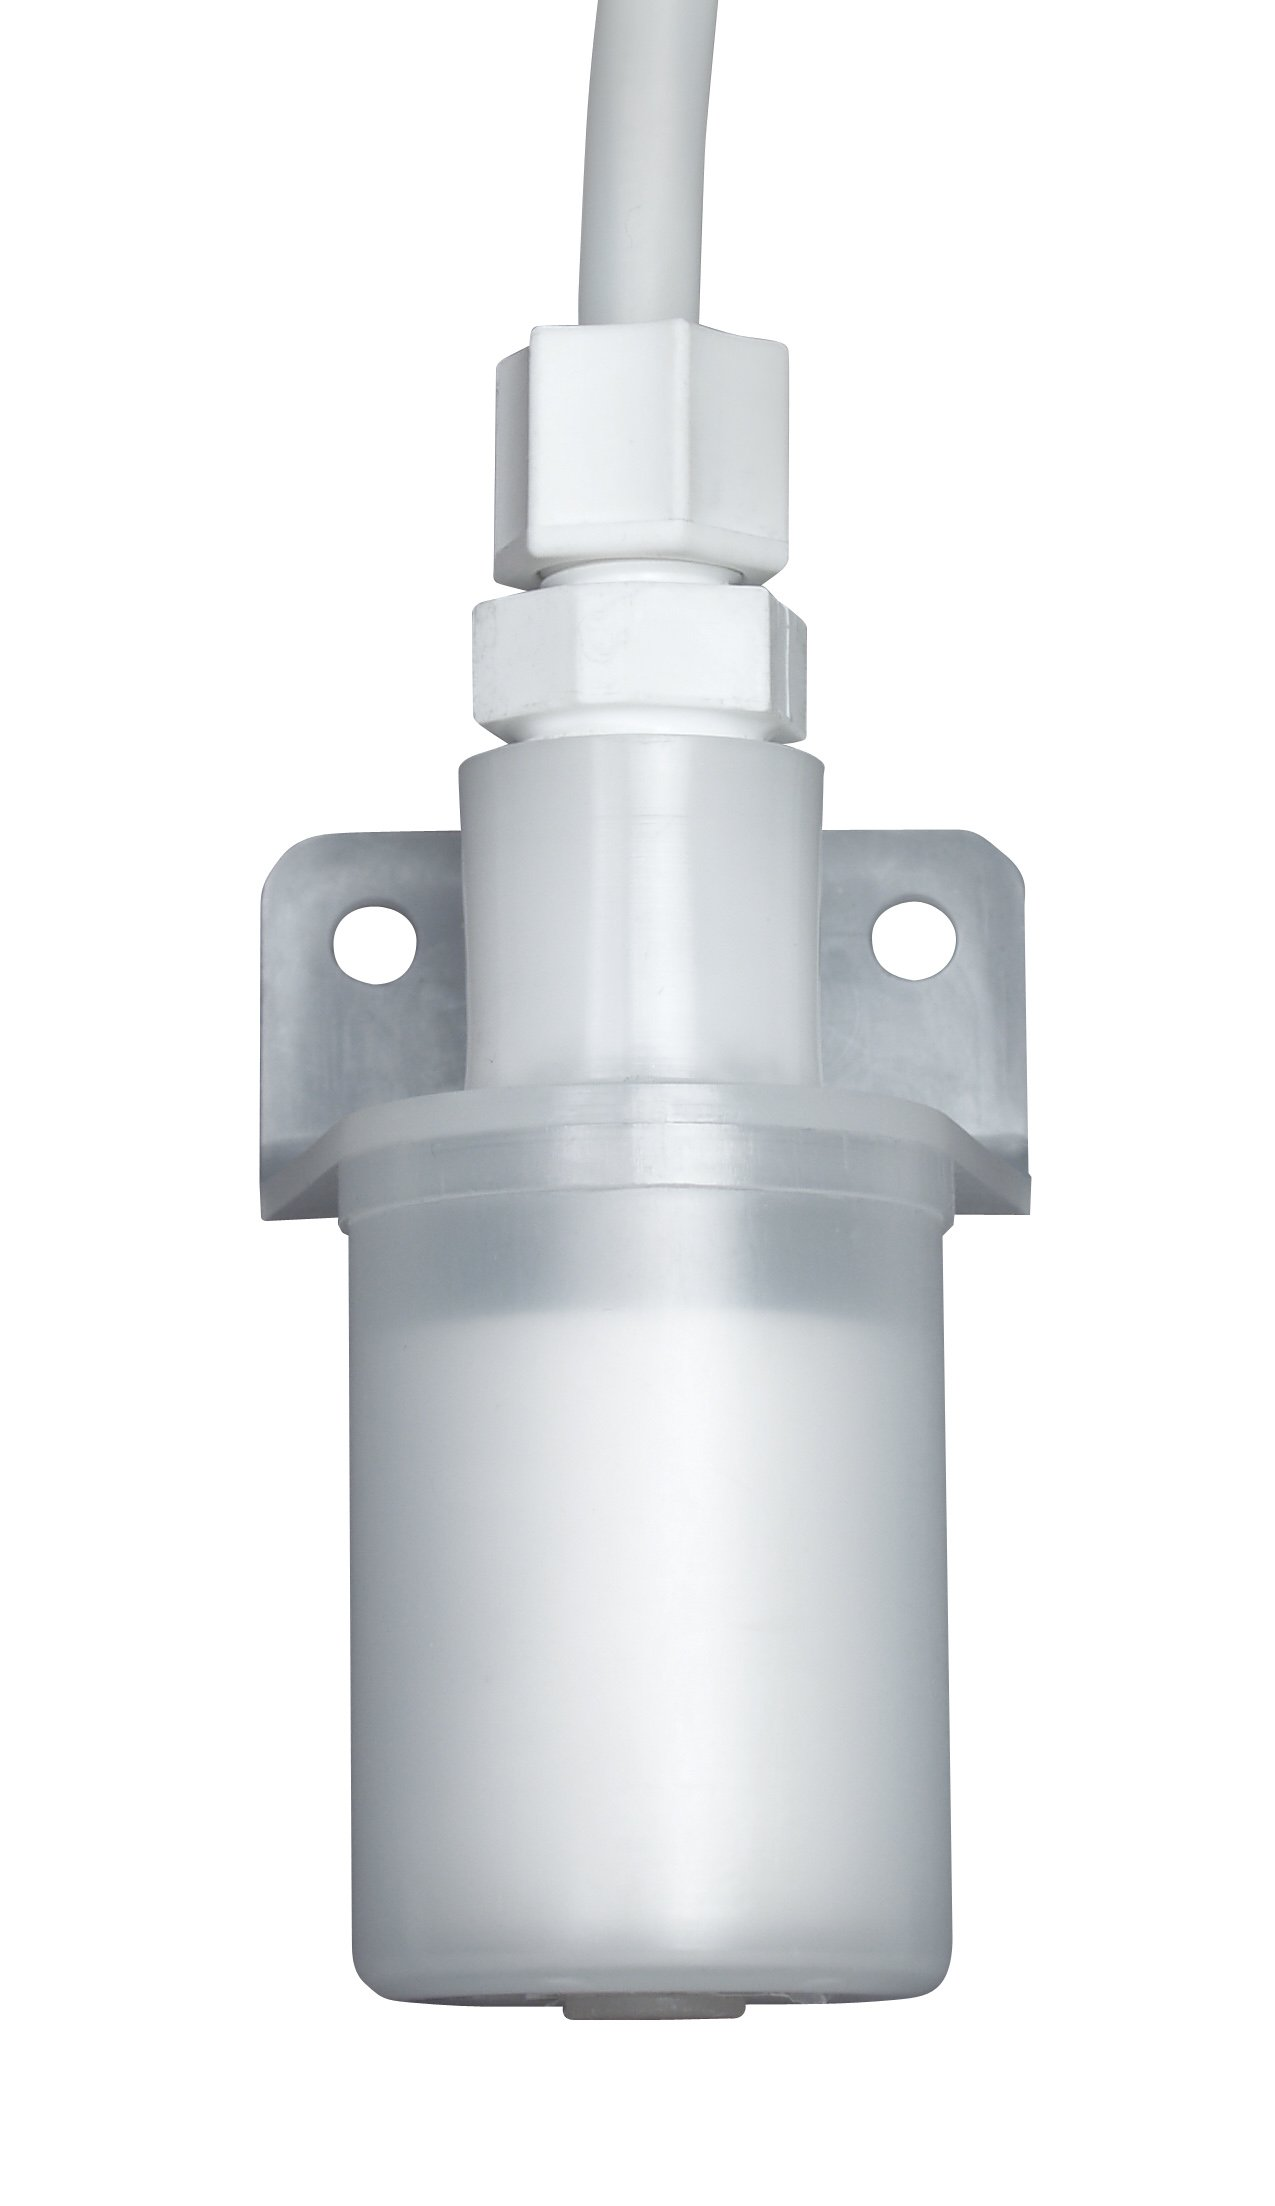 Madison MSB8800 Plastic Bracket Mounted Full Size Liquid Level Switch, 60 VA SPST, 100 psig Pressure